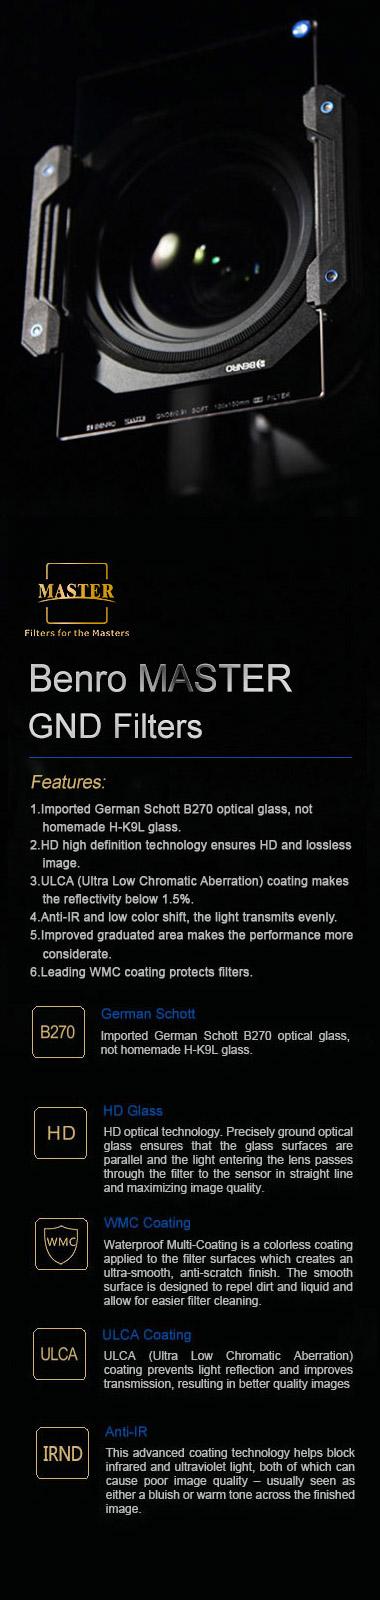 Benro filtros Master